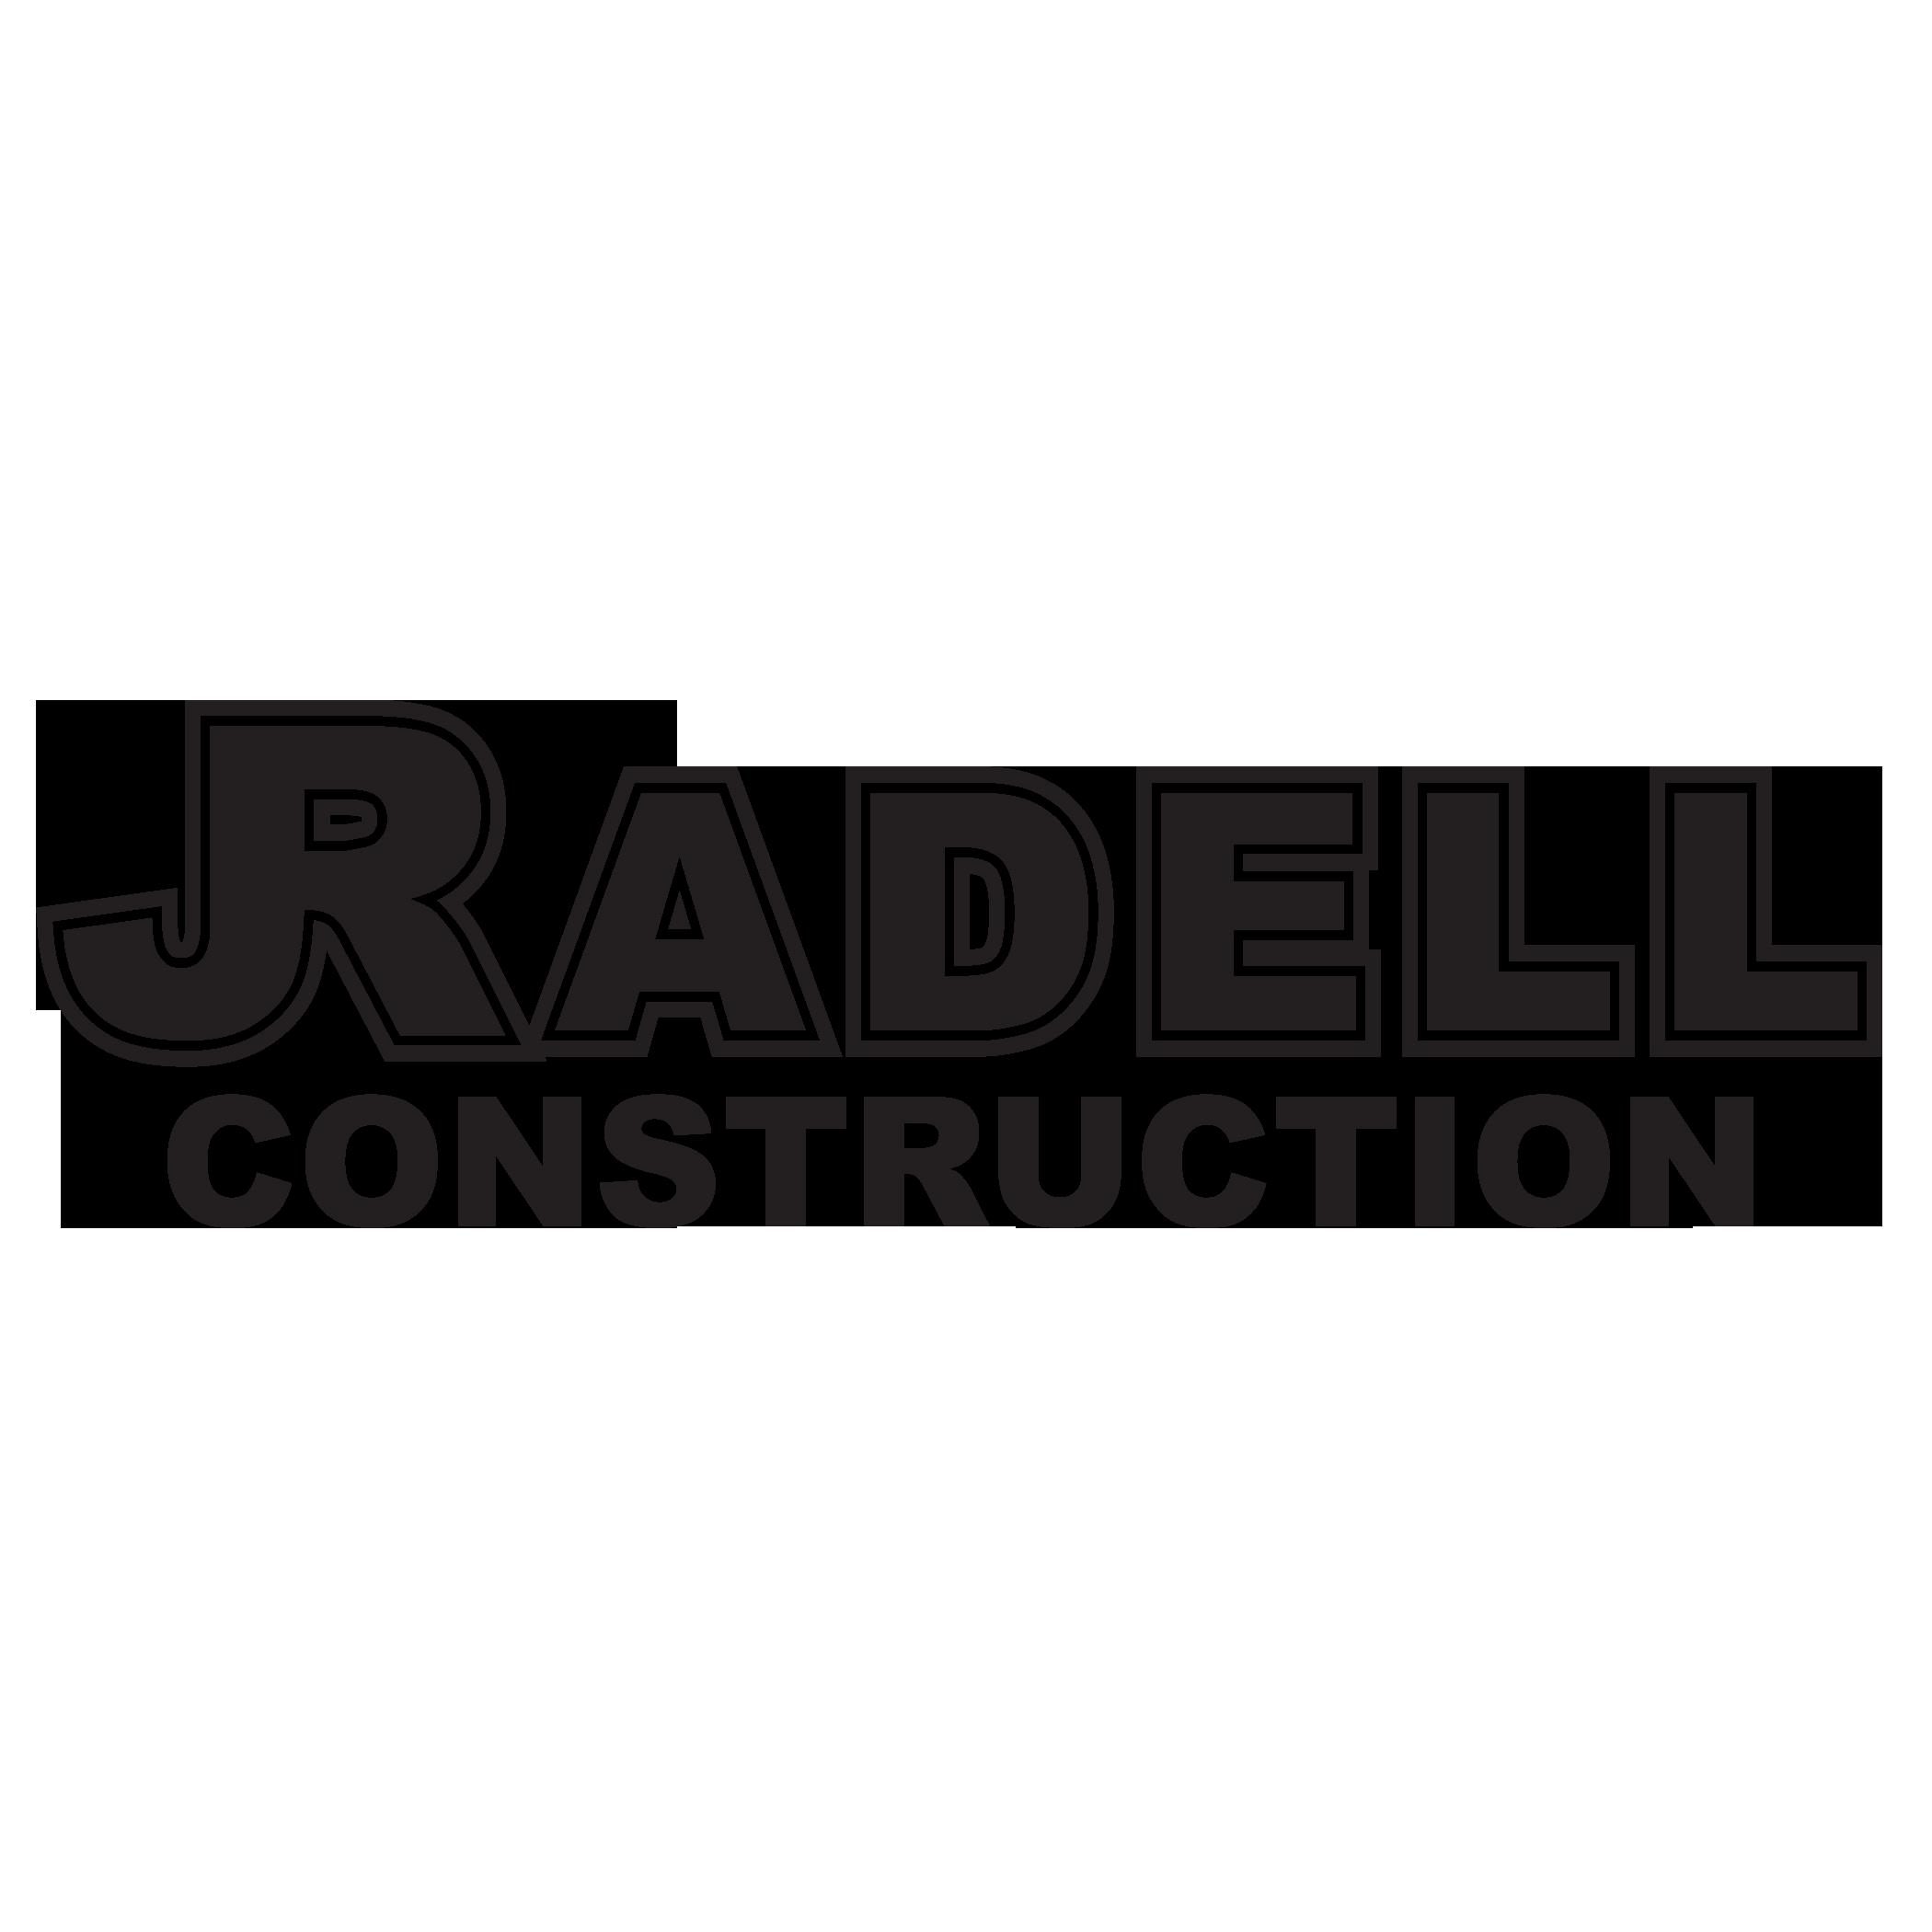 JIM RADELL CONSTRUCTION.png